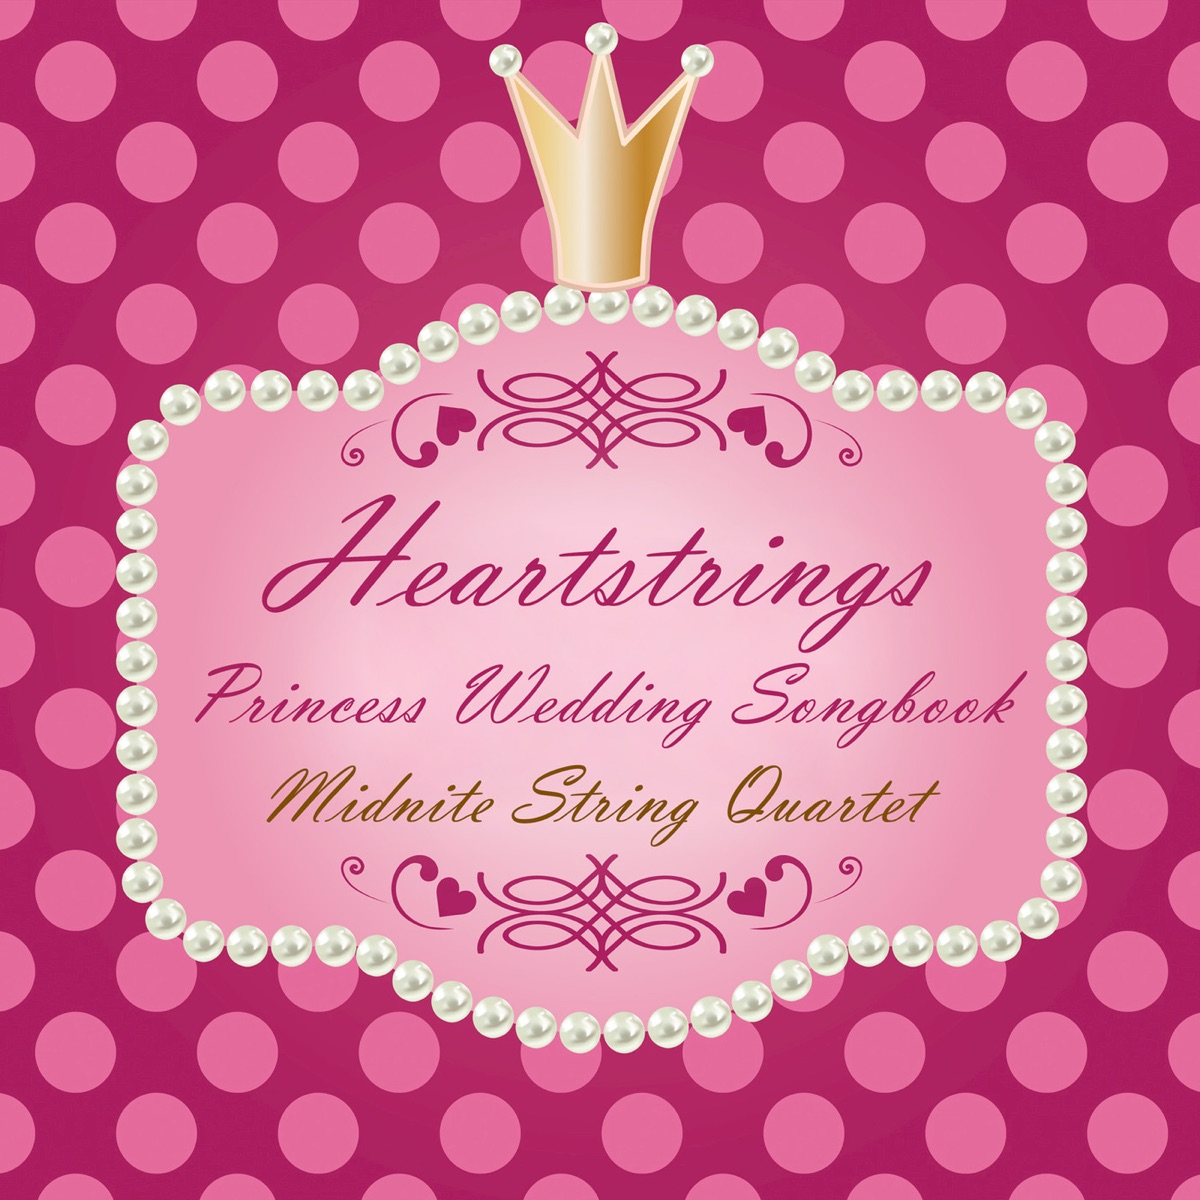 Heartstrings Princess Wedding Songbook Midnite String Quartet CD cover